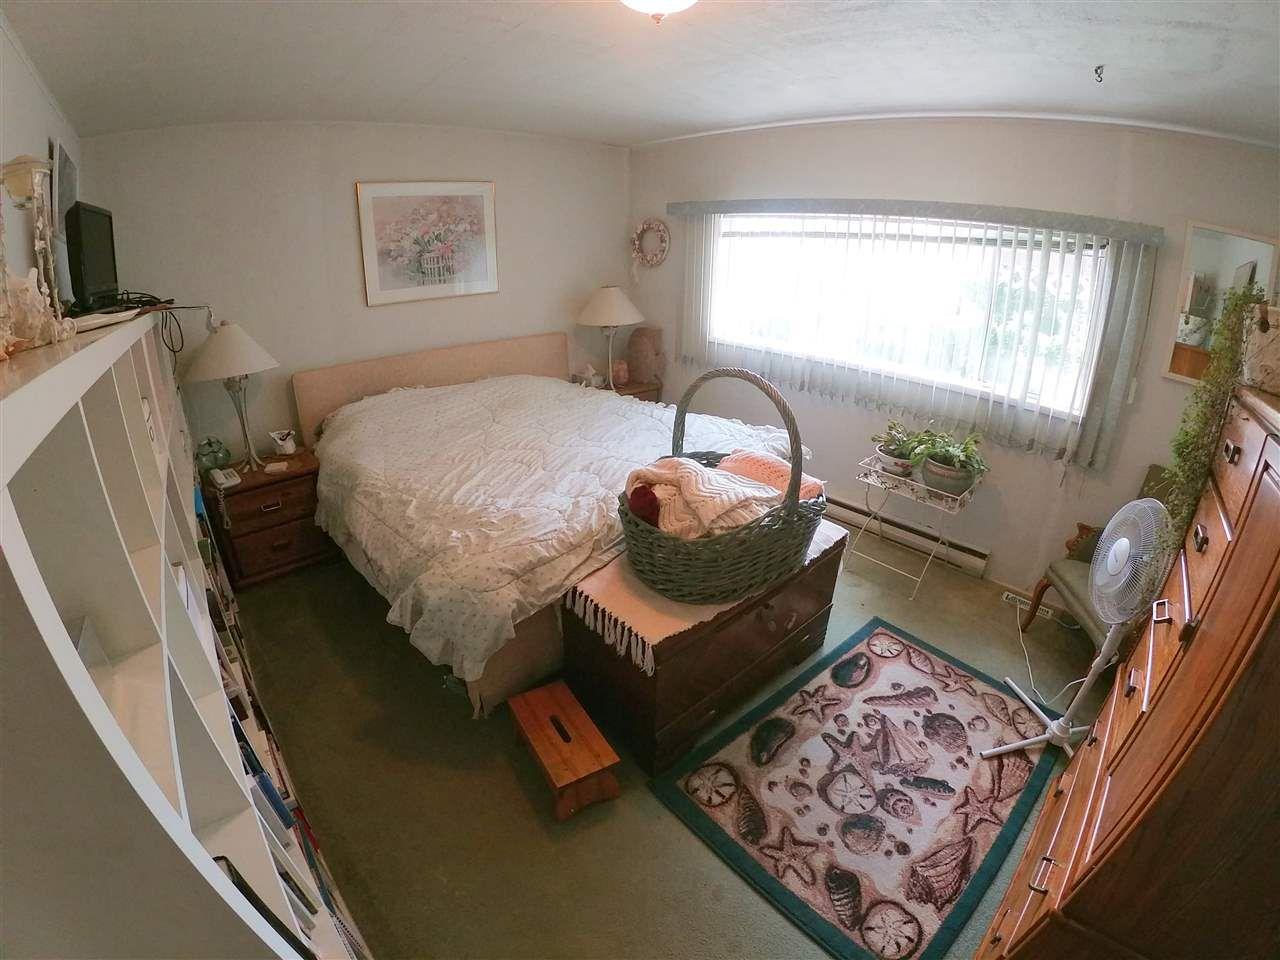 Photo 14: Photos: 5702 MEDUSA Street in Sechelt: Sechelt District House for sale (Sunshine Coast)  : MLS®# R2323721